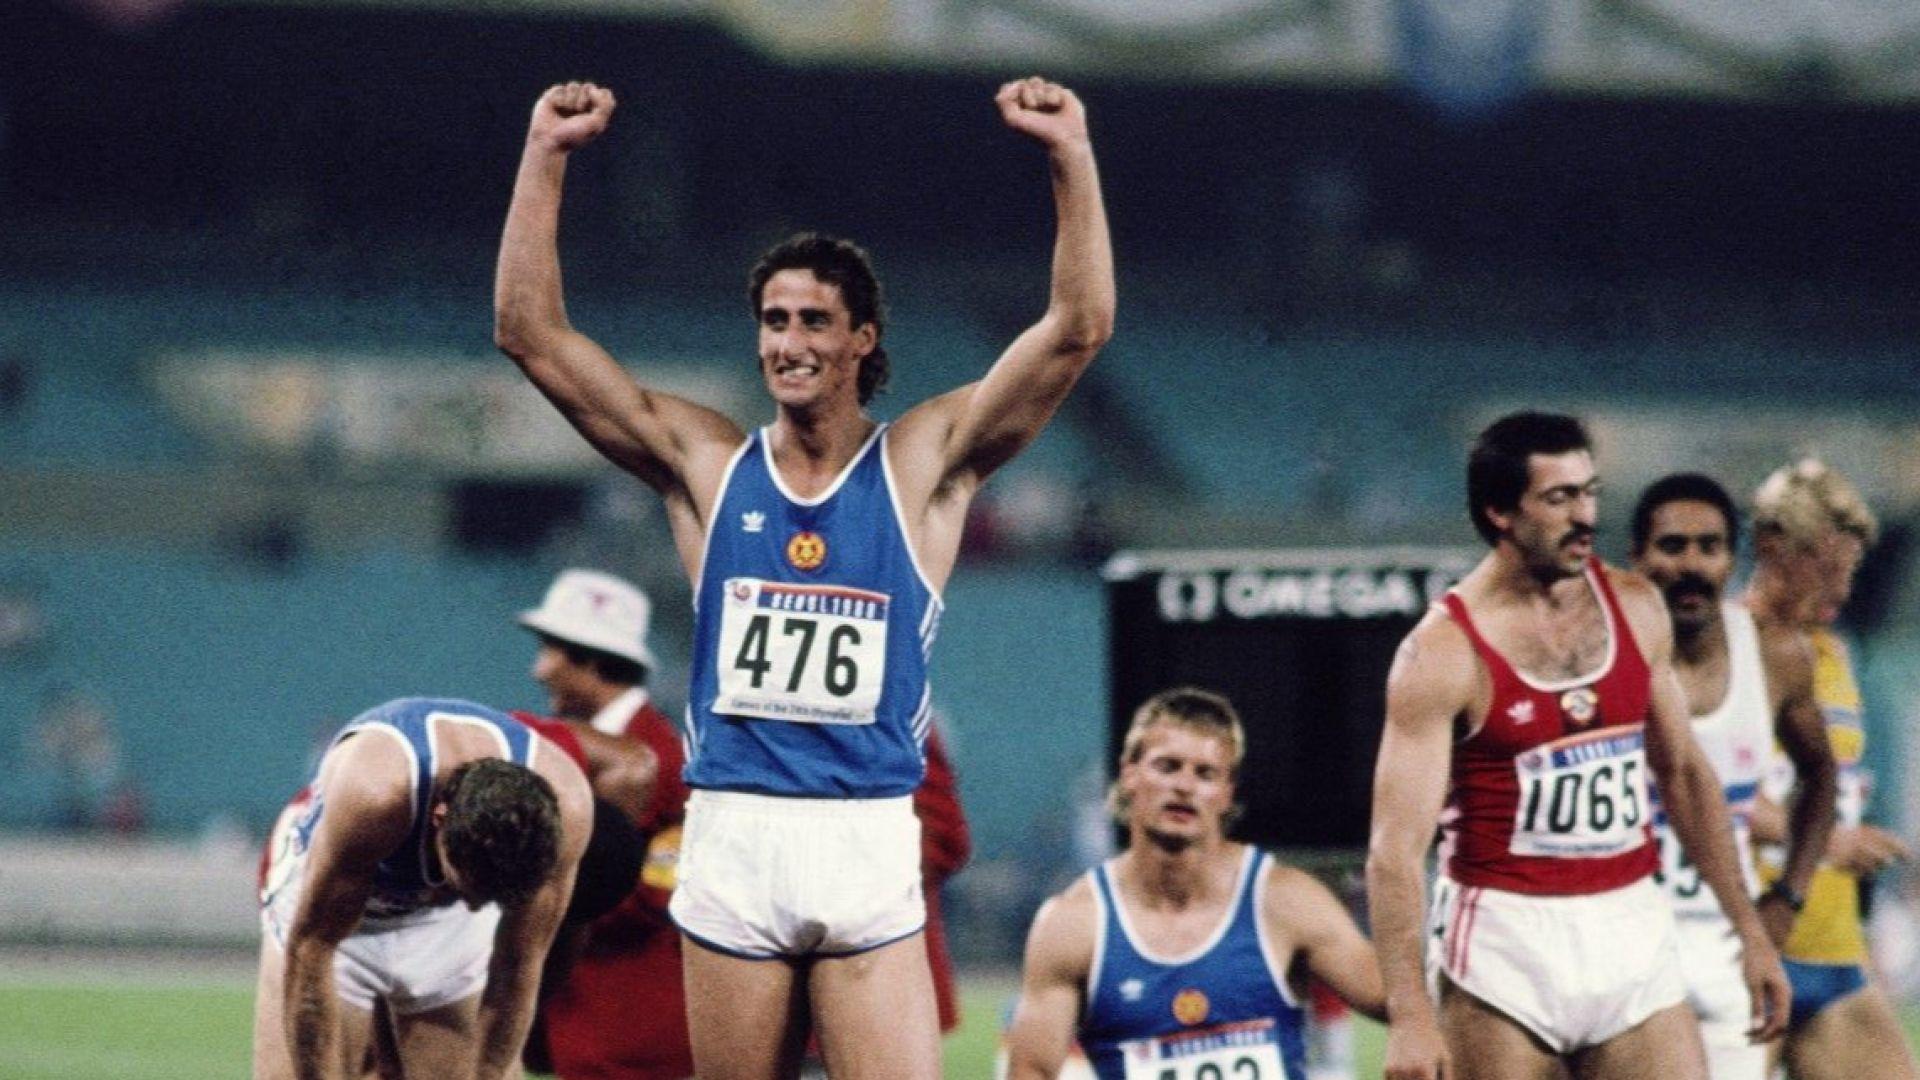 Олимпийски шампион от Сеул призна за употреба на допинг